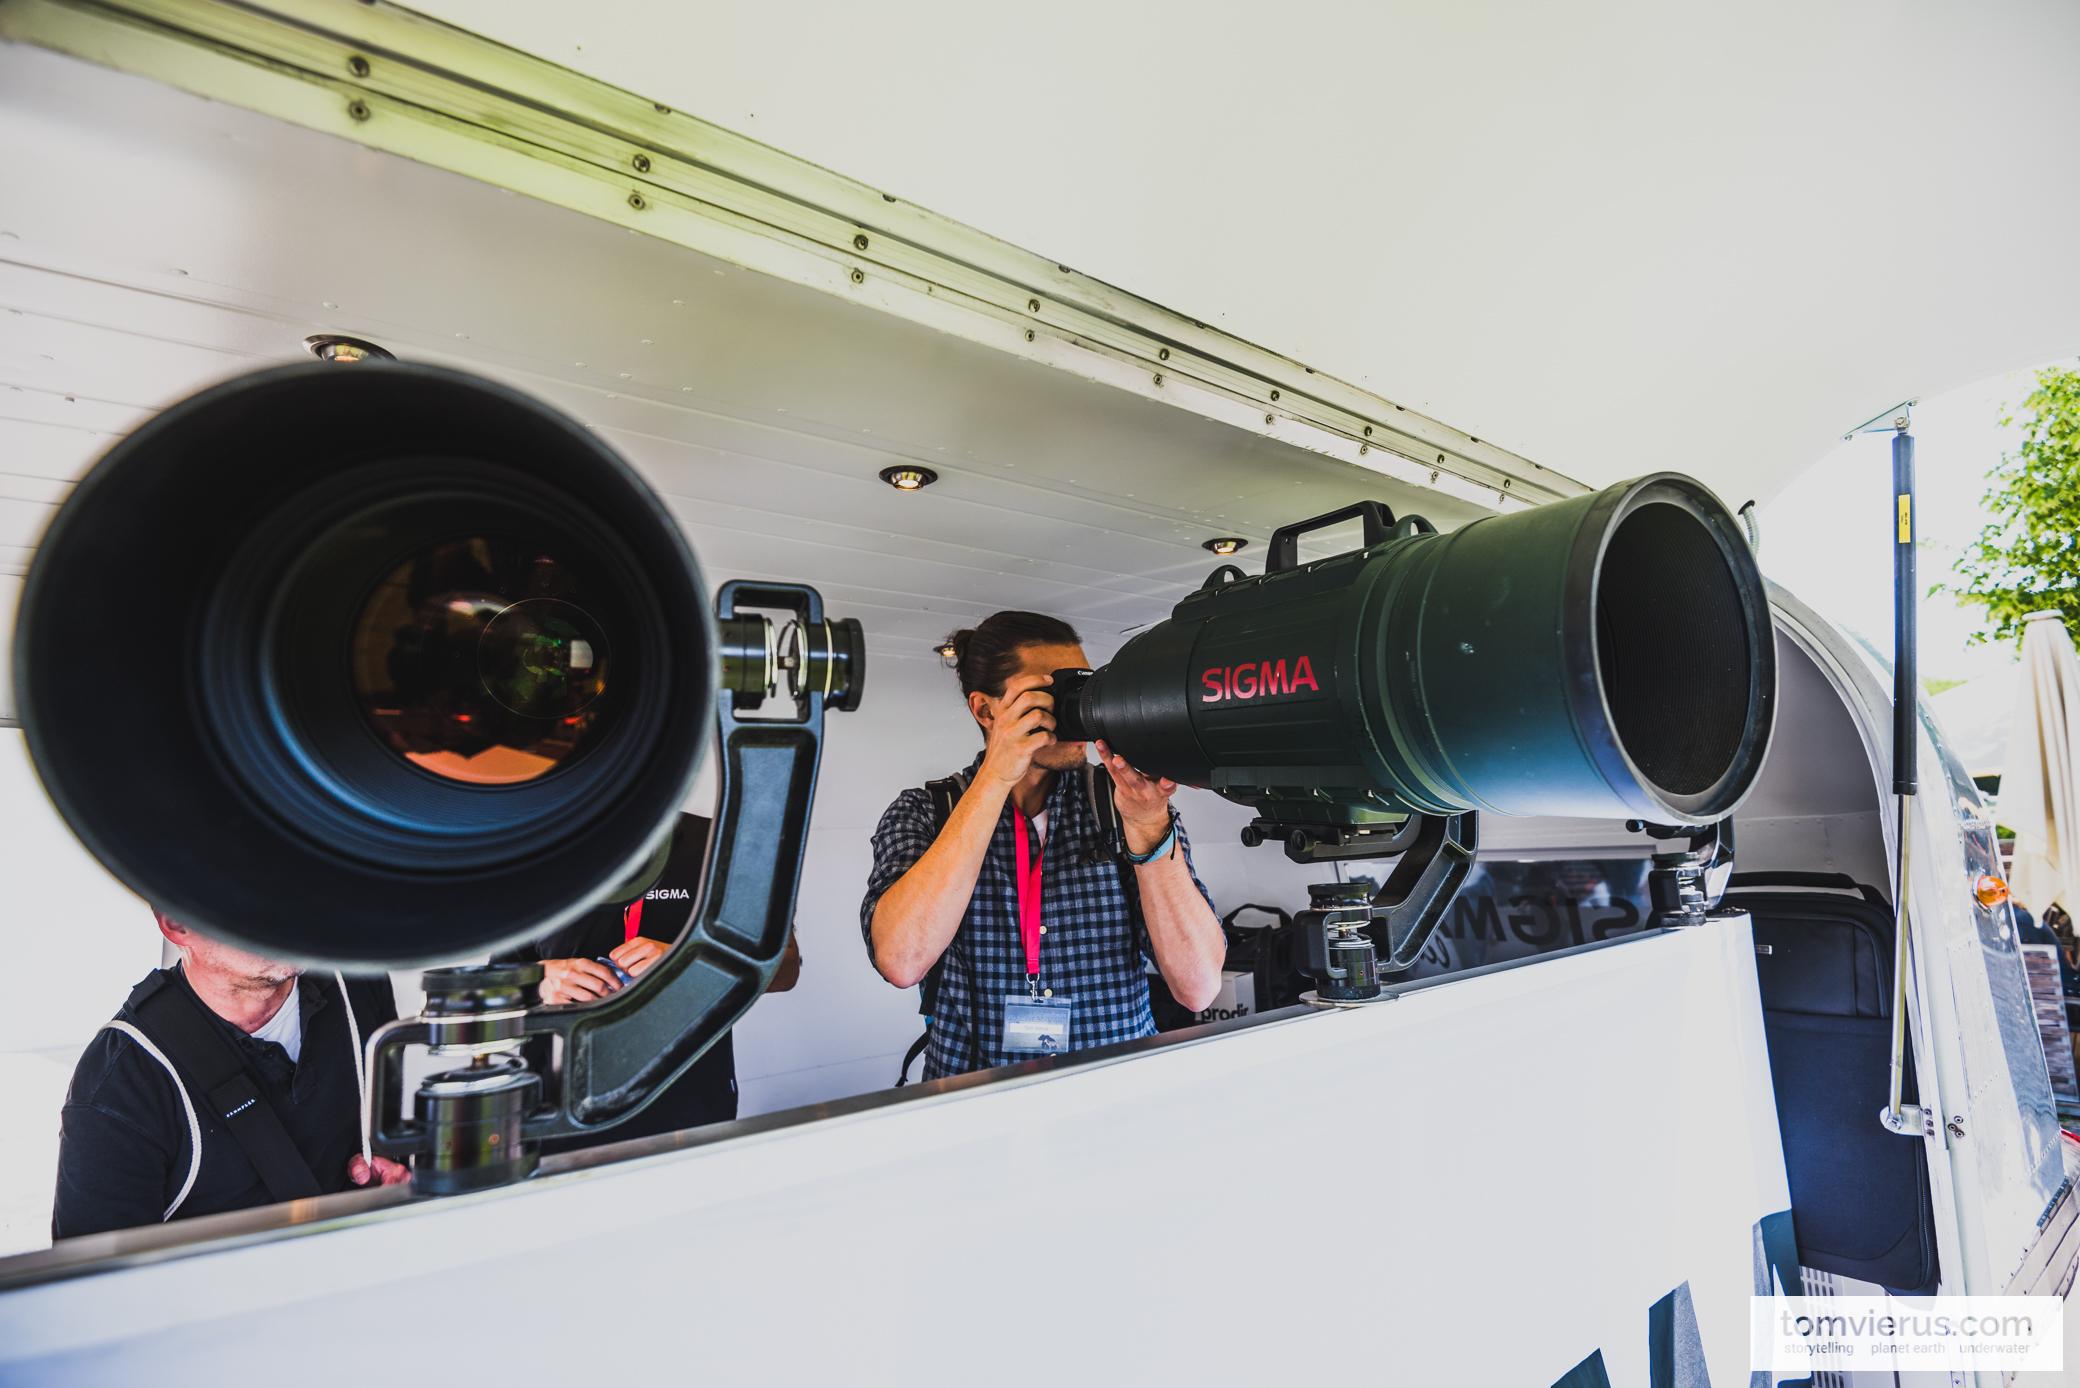 Signa lens, Tom Vierus, Photography, Festival, Glanzlichter